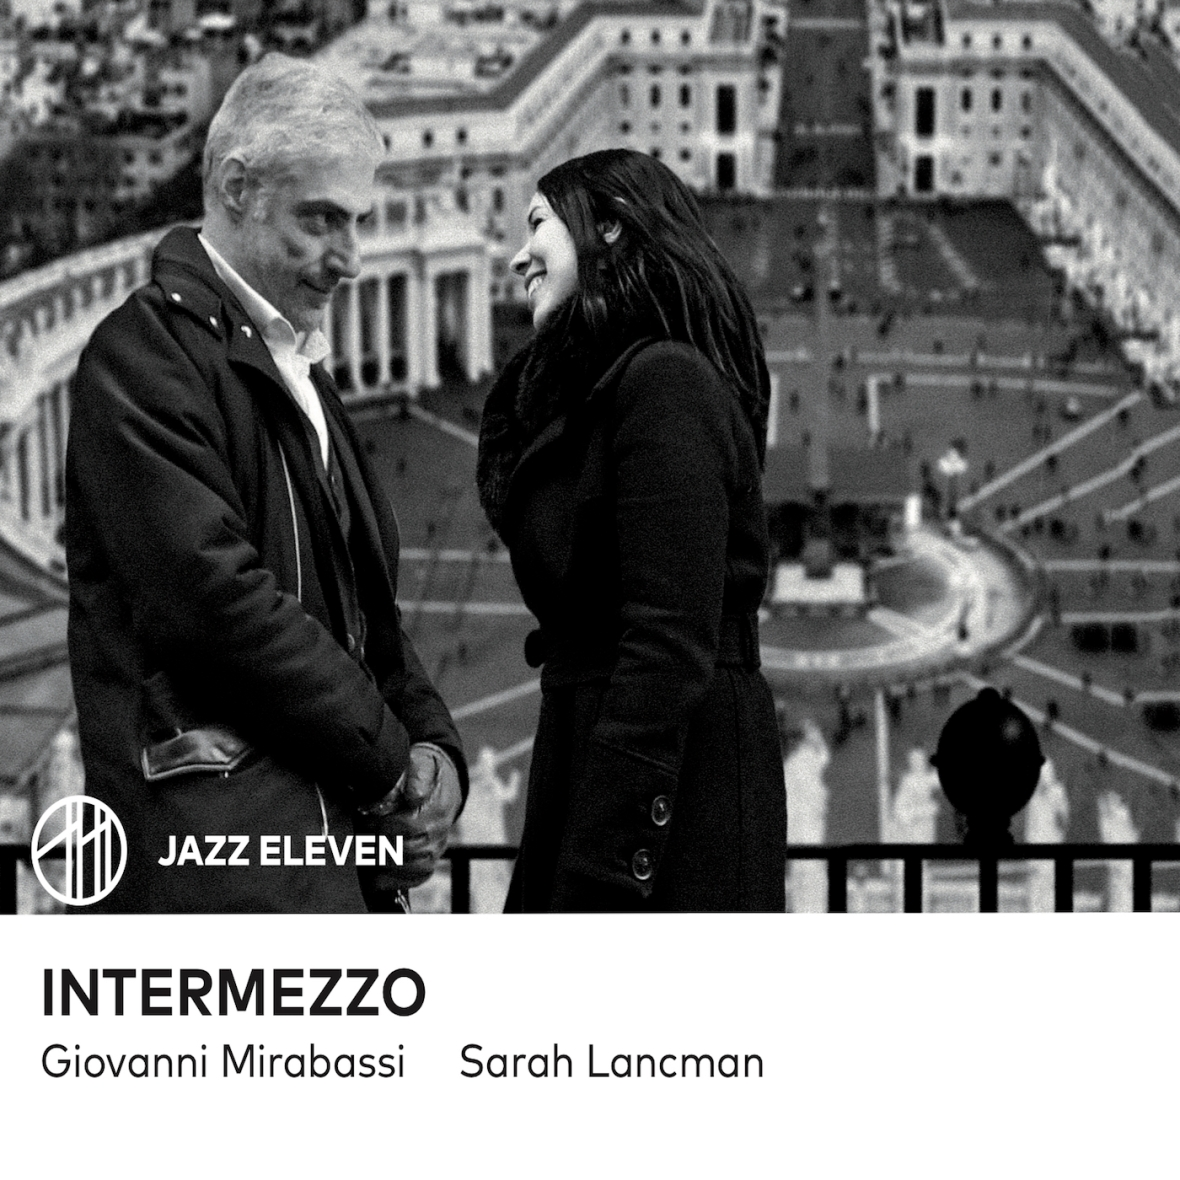 Sarah Lancman - Giovanni Mirabassi : Intermezzo